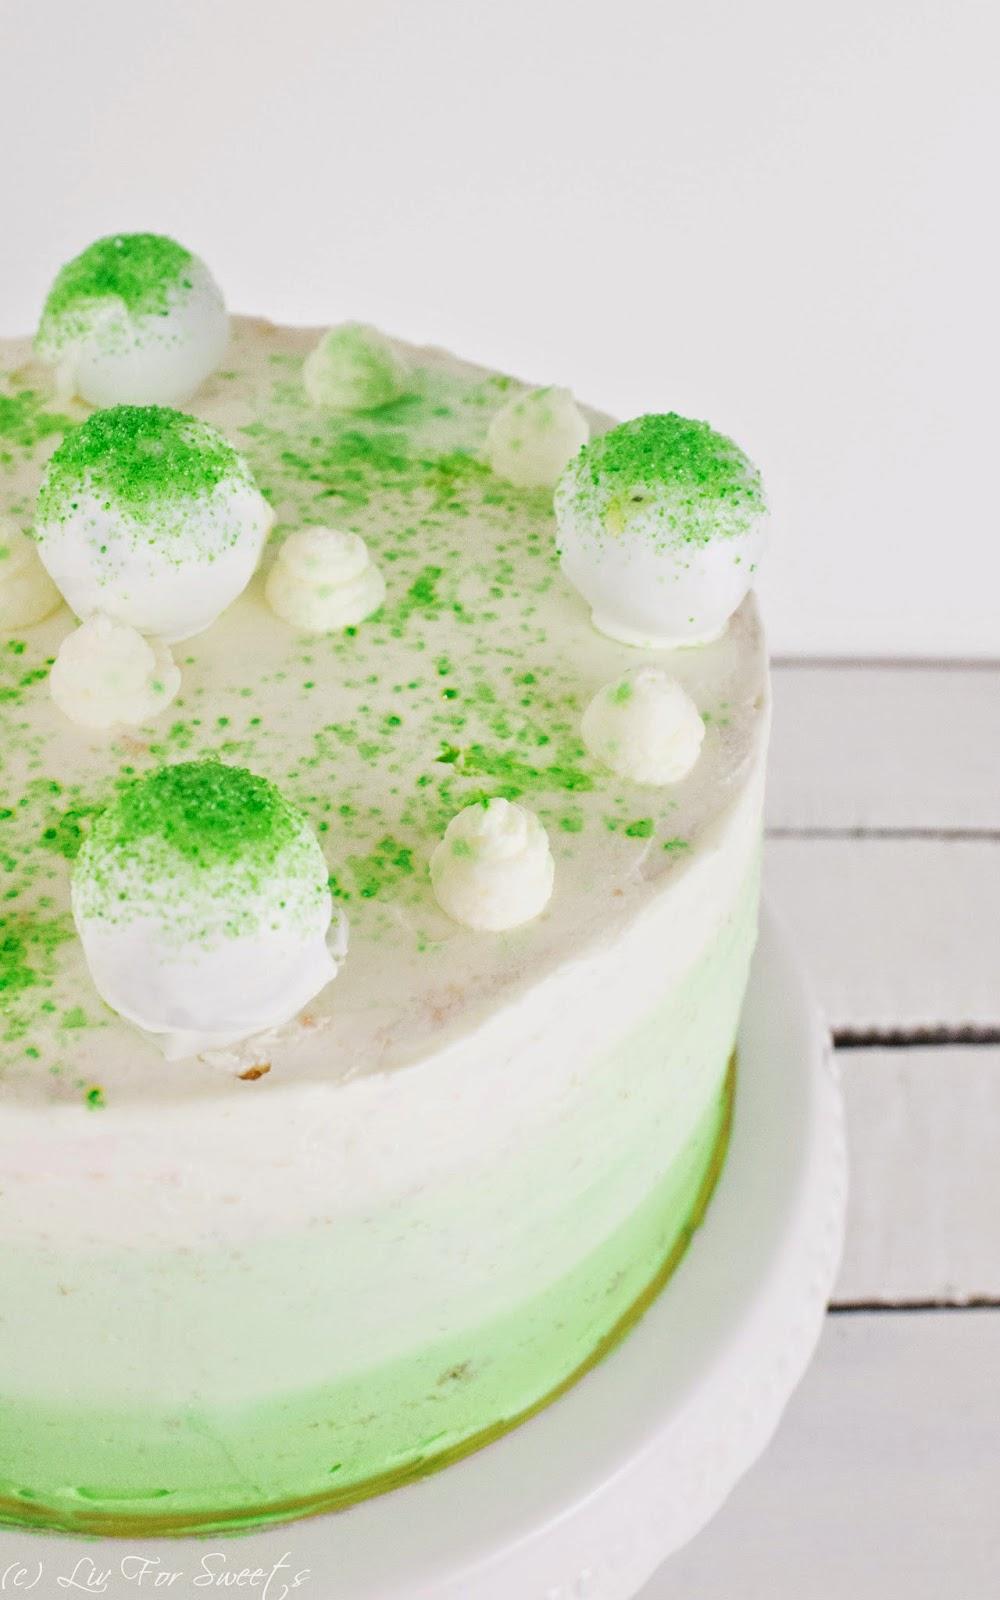 Limetten, Käsesahne, Quark, Himbeere, Biskuit, Frischkäse, Cakebites, Cake-Bites, Cakepops, Cake-Pops, Cakepop-Torte, Cakebite-Torte, grün, Ombre-Frosting, Ombre-Torte, Thermomix